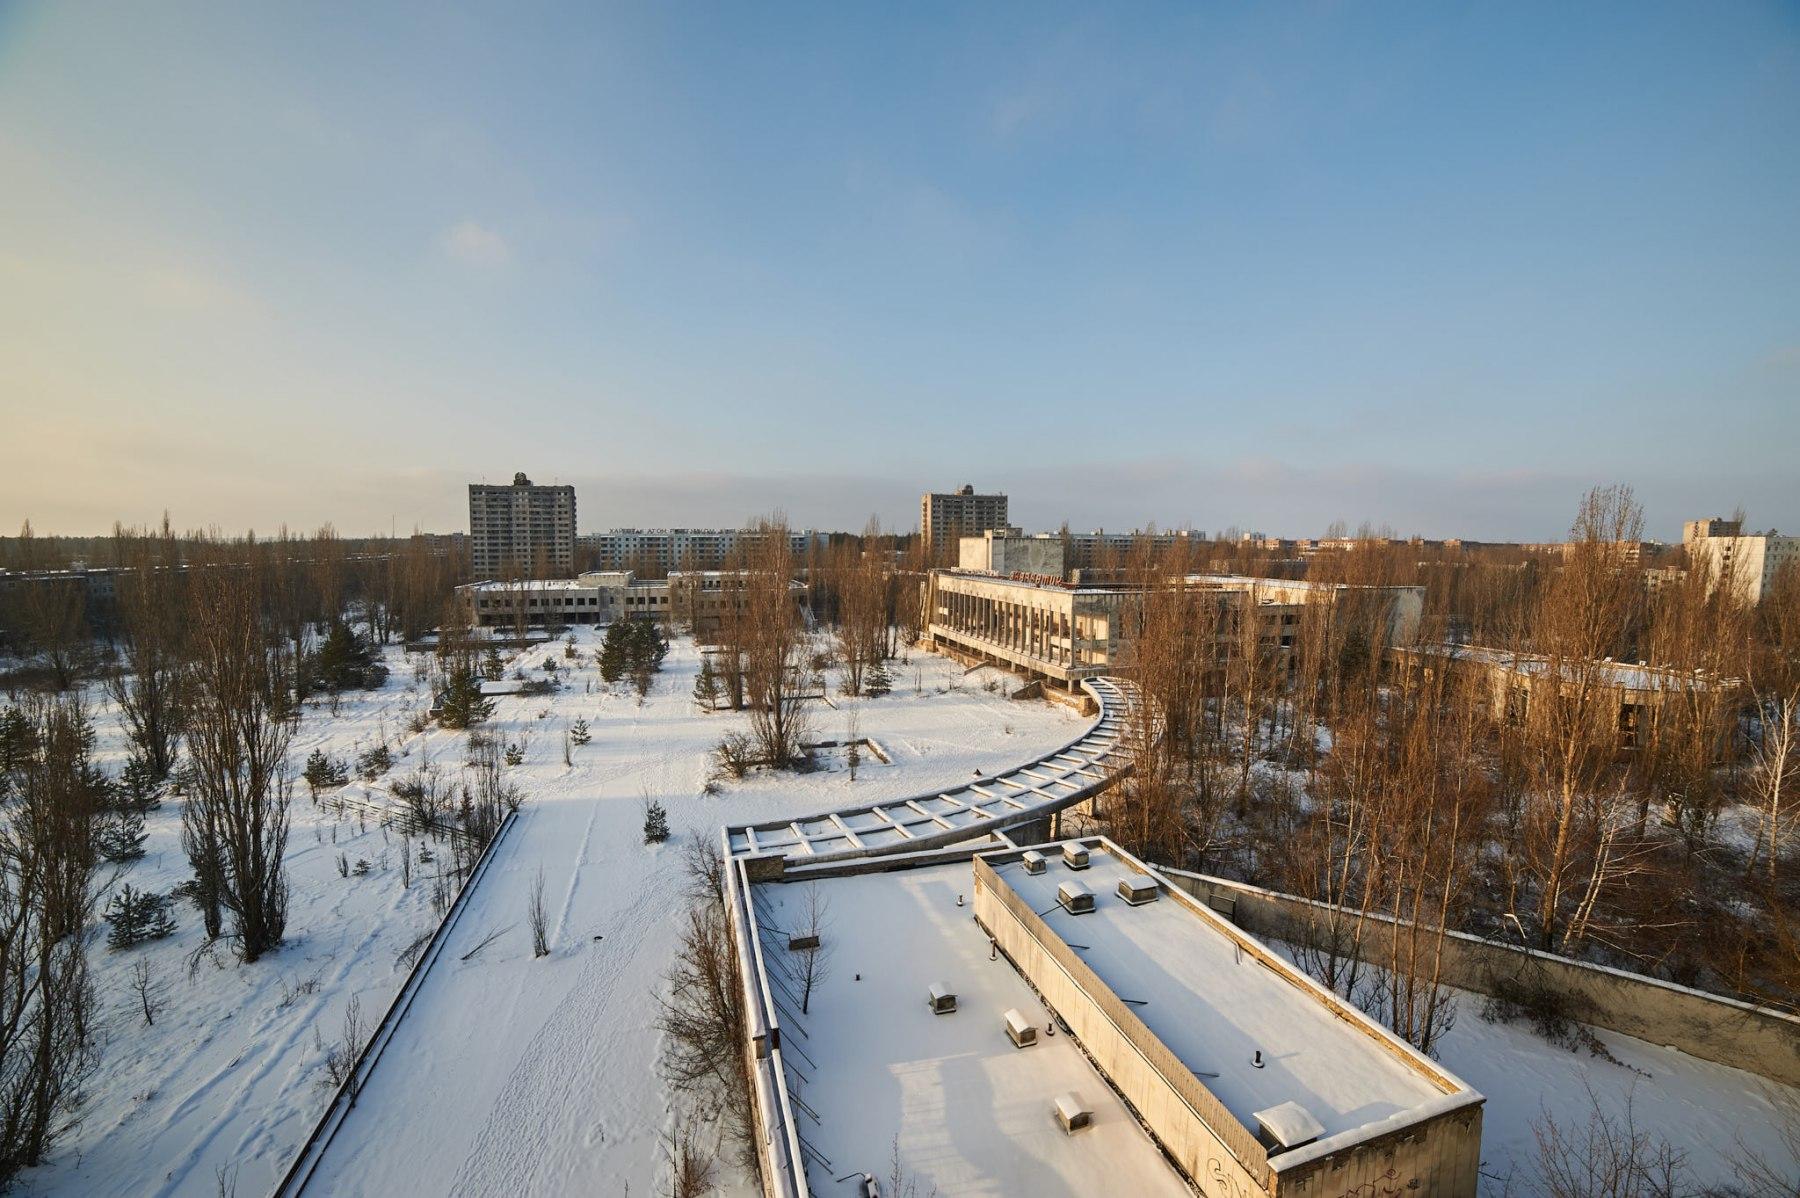 Czarnobyl_p1_013